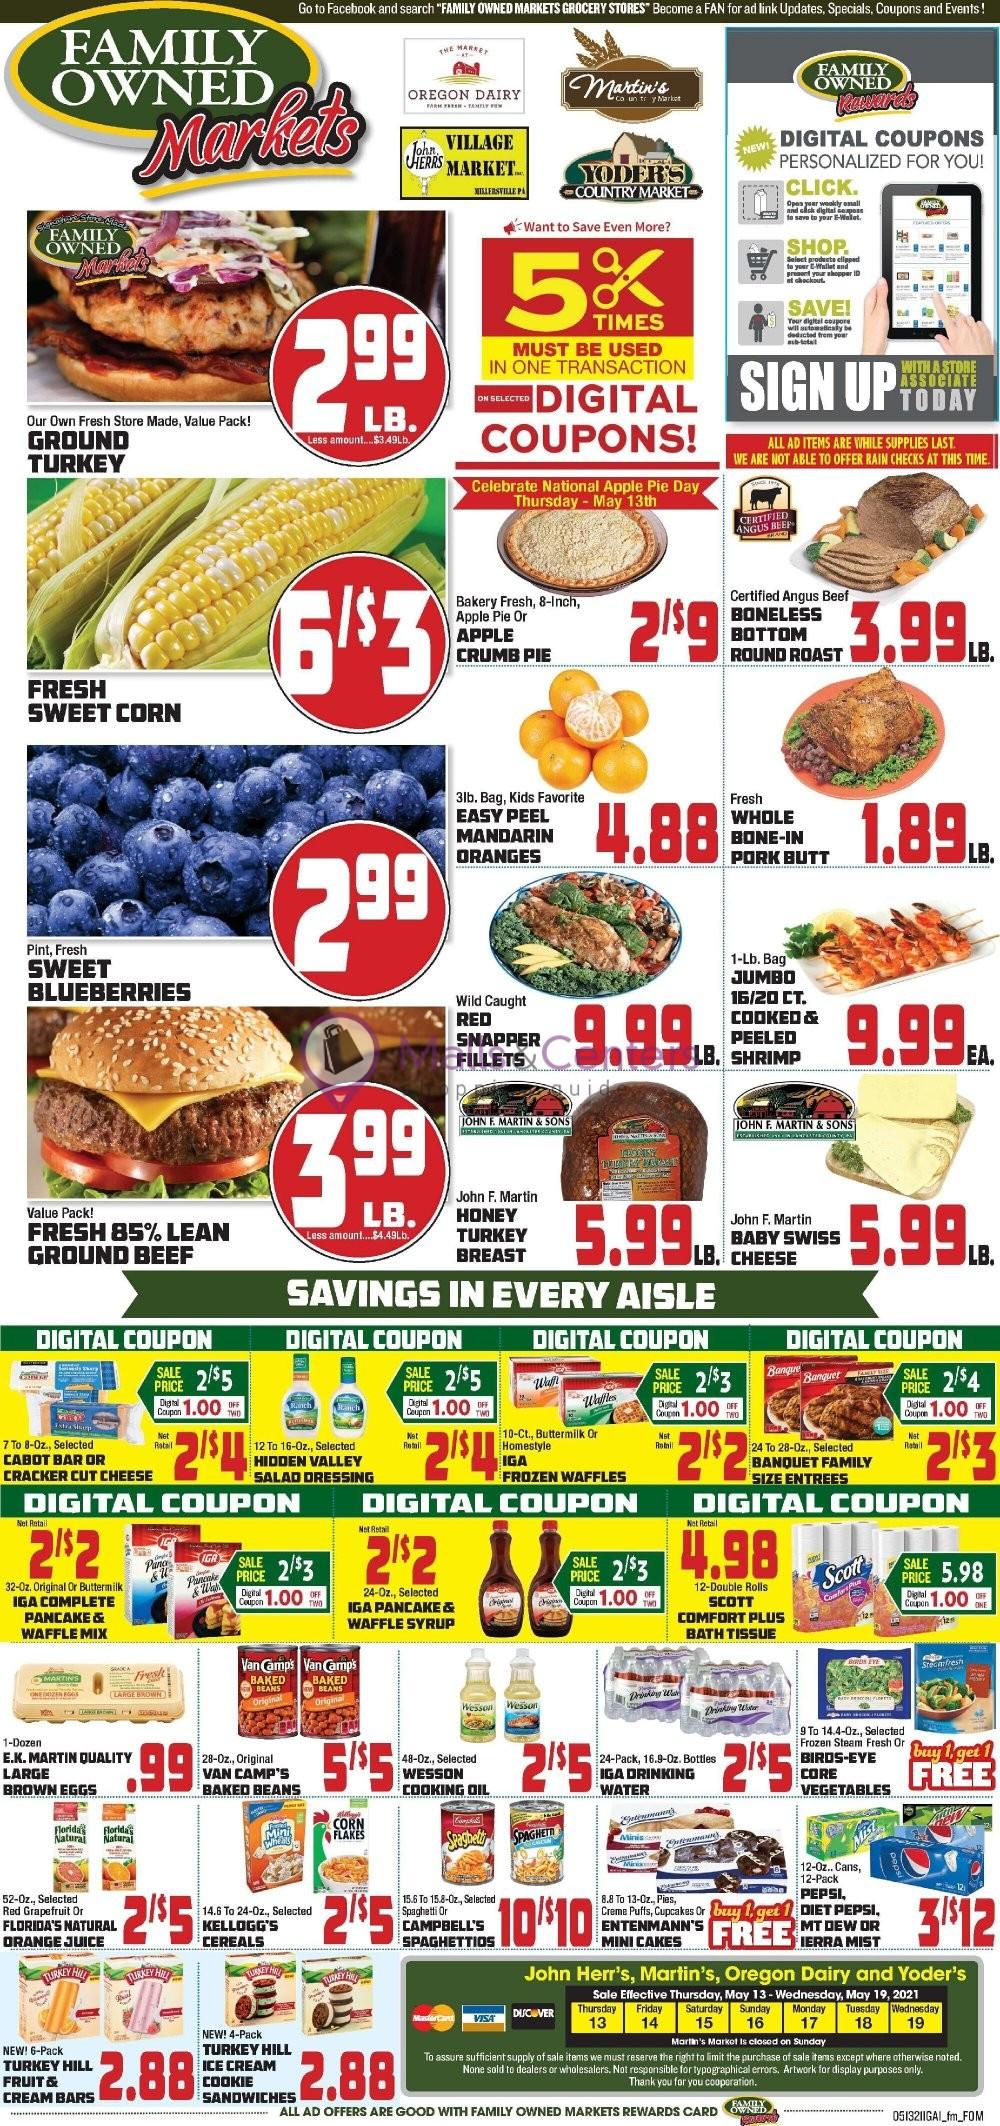 weekly ads John Herr's Village Market - page 1 - mallscenters.com